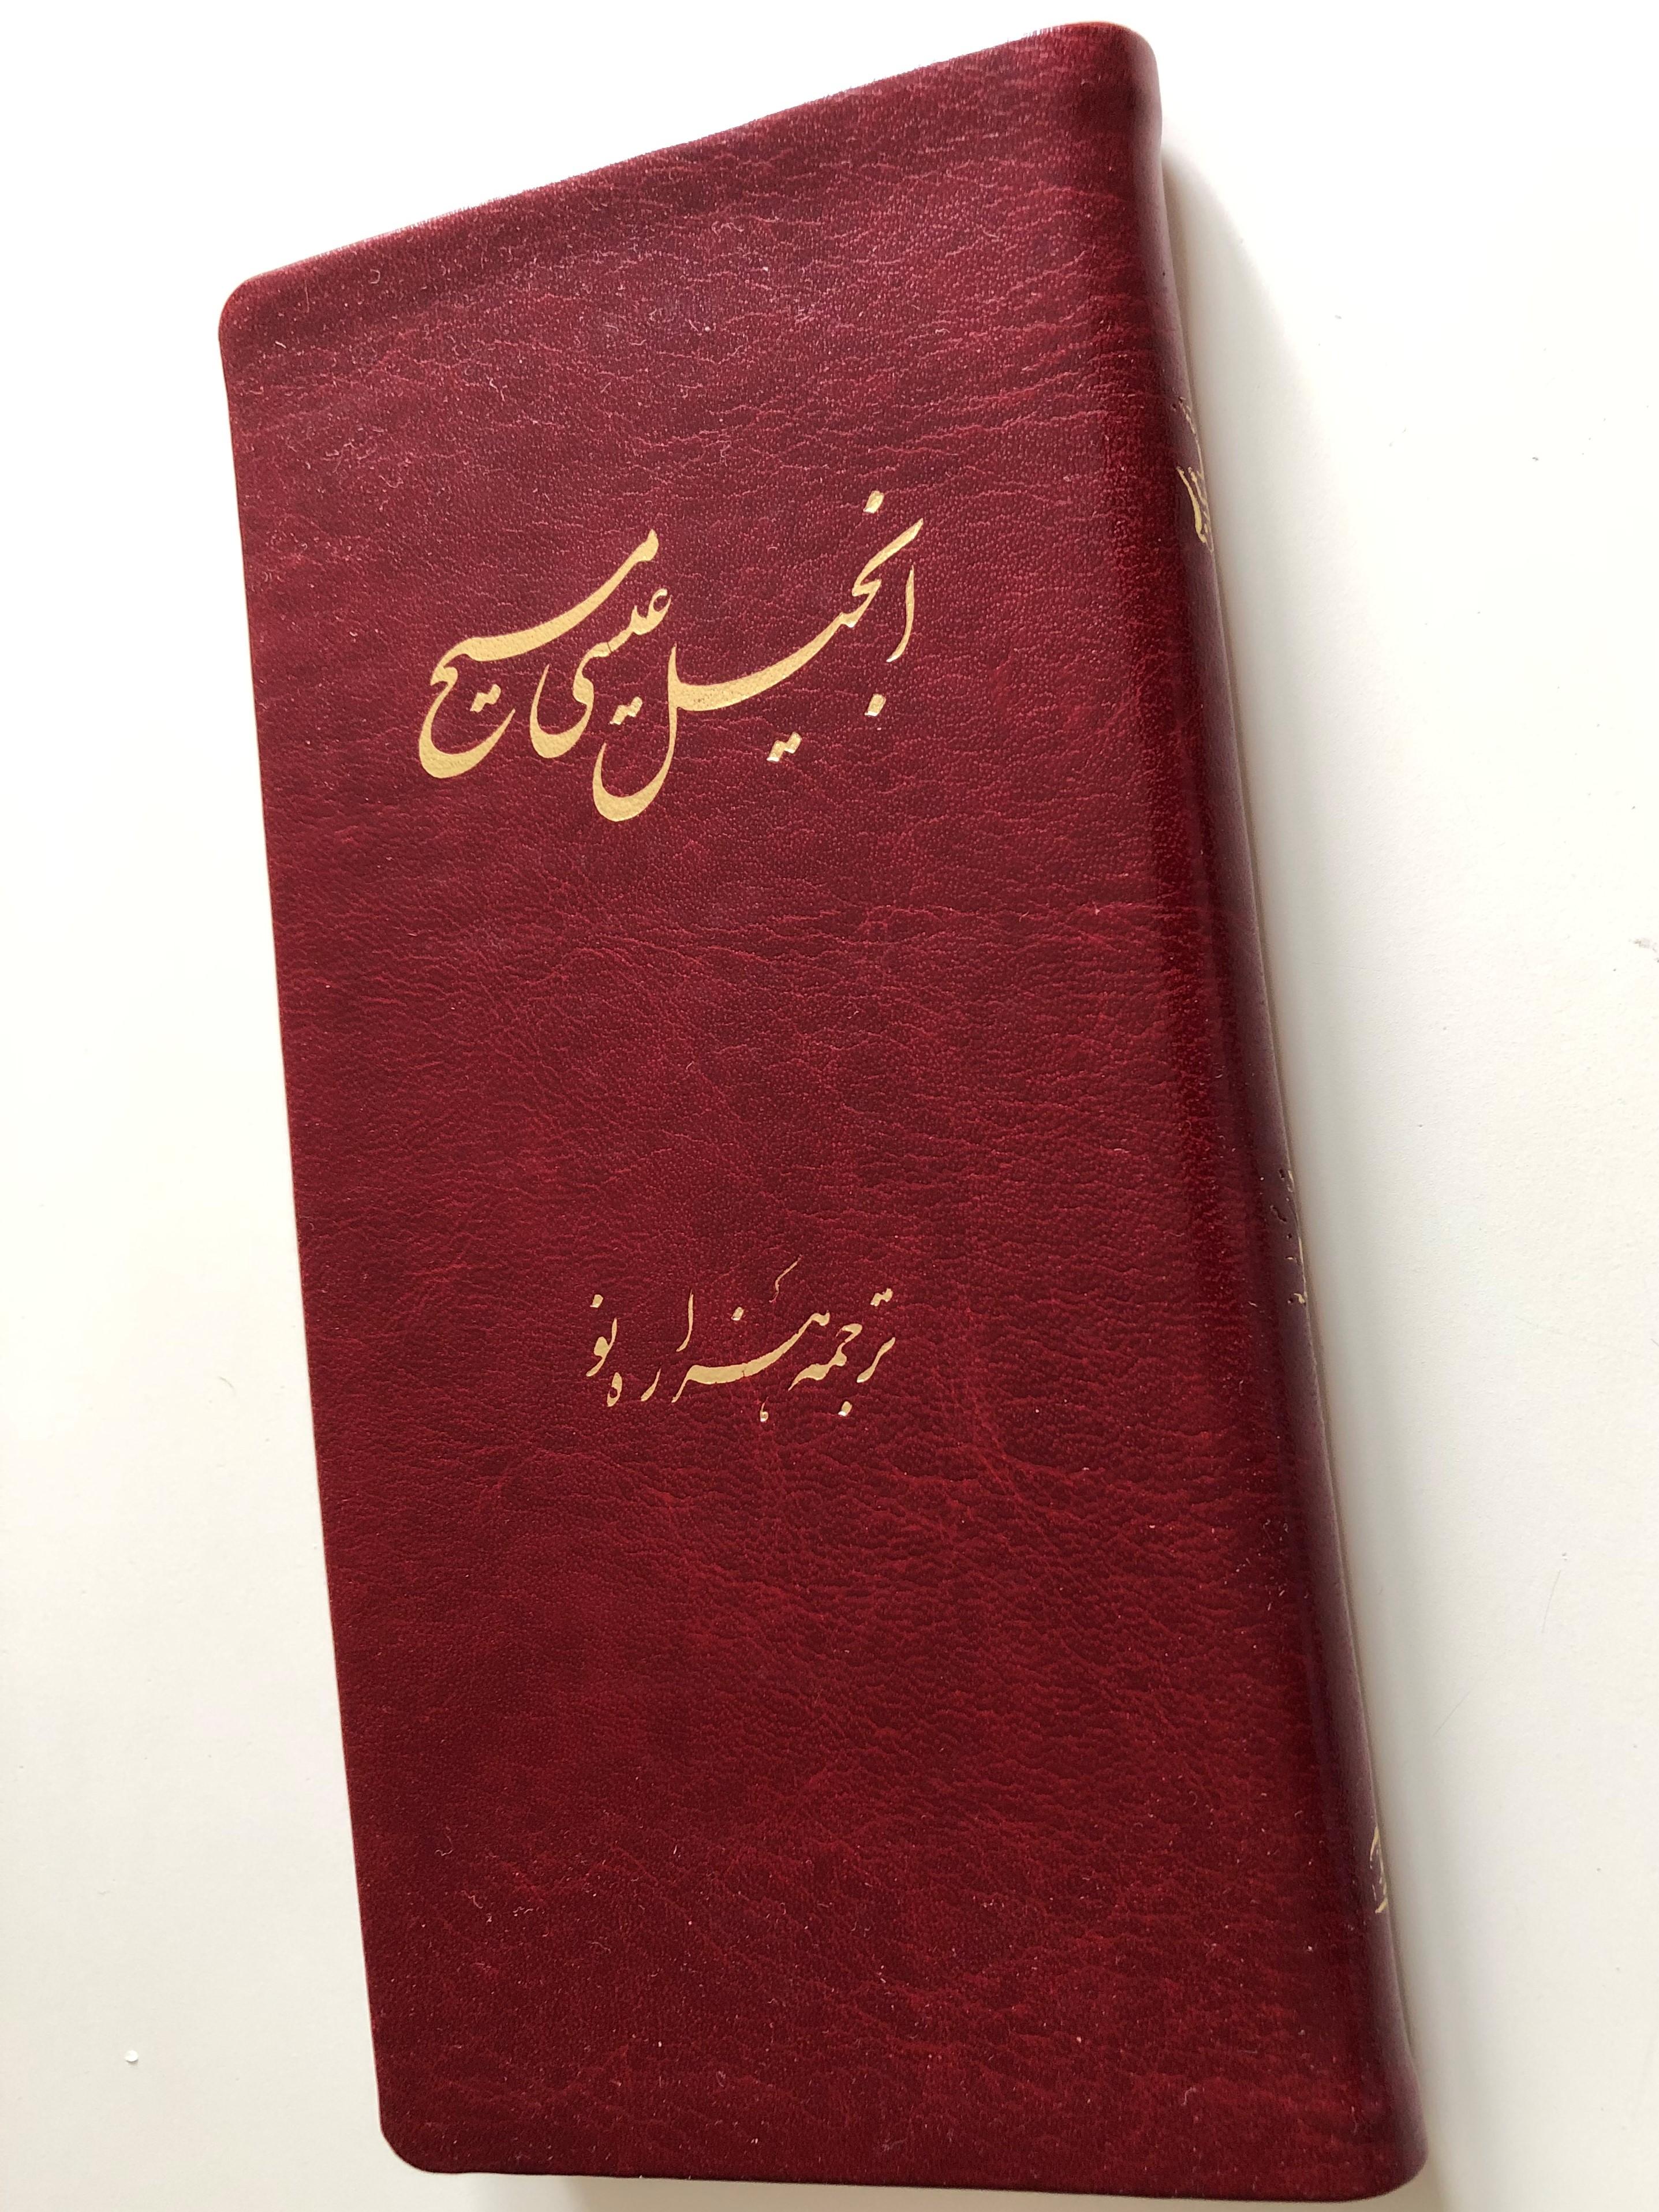 new-testament-in-persian-farsi-language-imitation-leather-bound-pocket-edition-new-millenium-version-elam-ministries-2006-1-.jpg